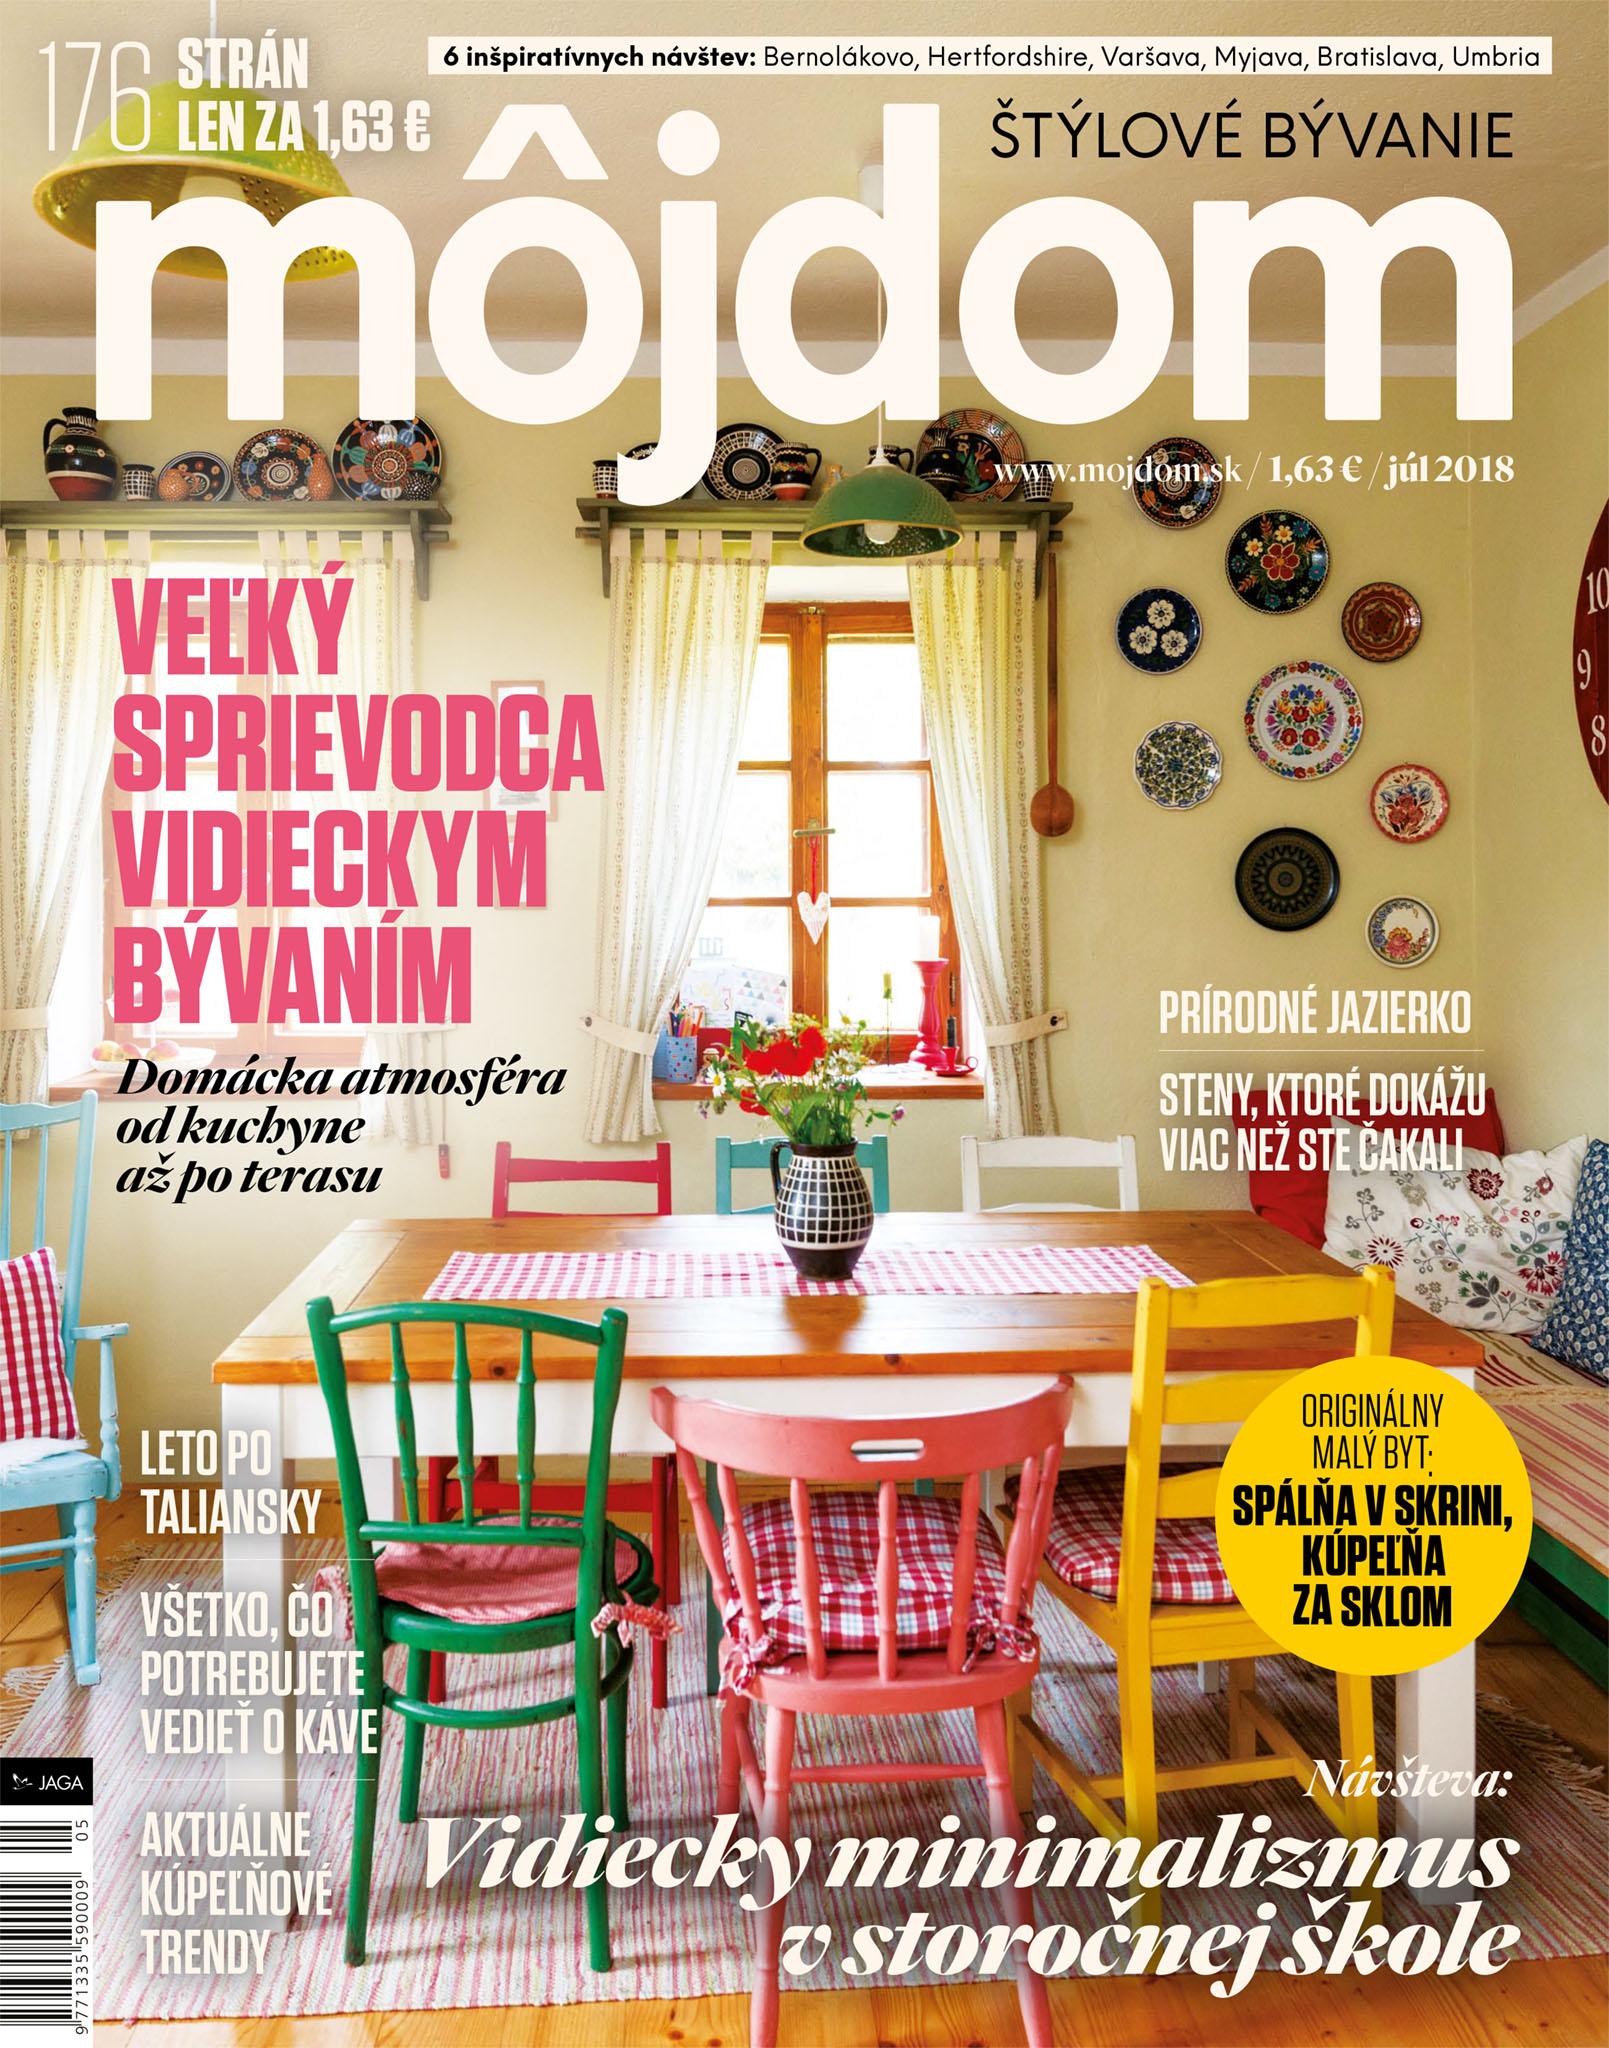 Cover foto: Ľuboš Paukeje